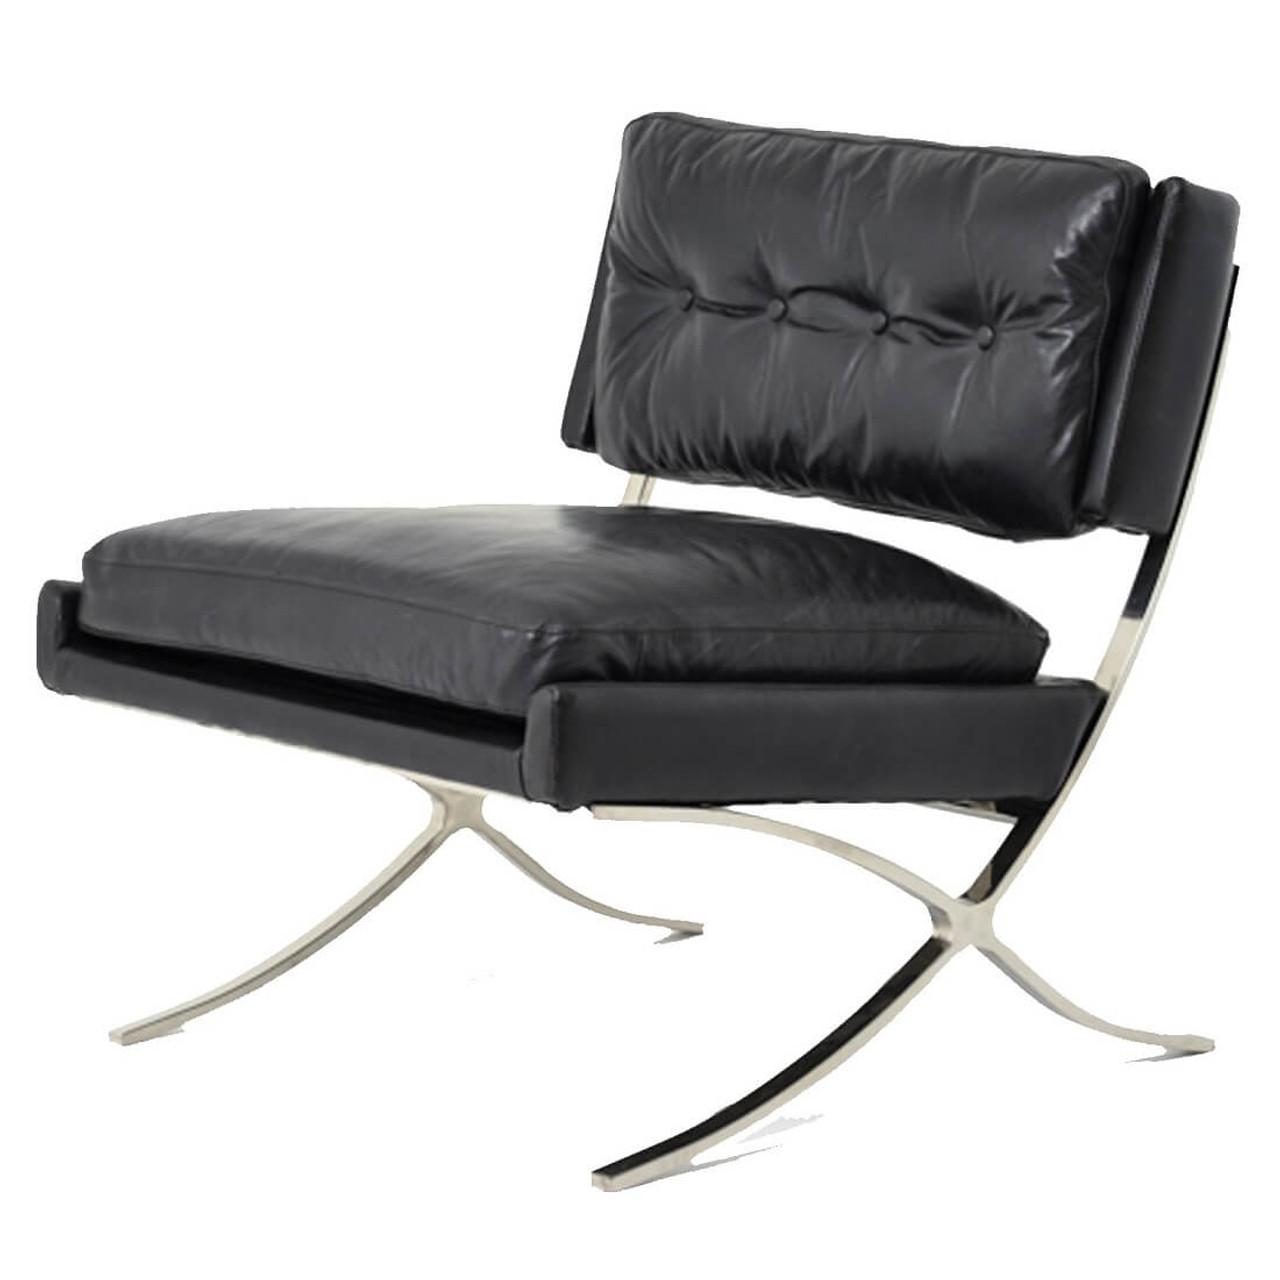 Heathrow Vintage Black Leather Lounge Chair  sc 1 st  Zin Home & Heathrow Vintage Black Leather Lounge Barcelona Chair | Zin Home